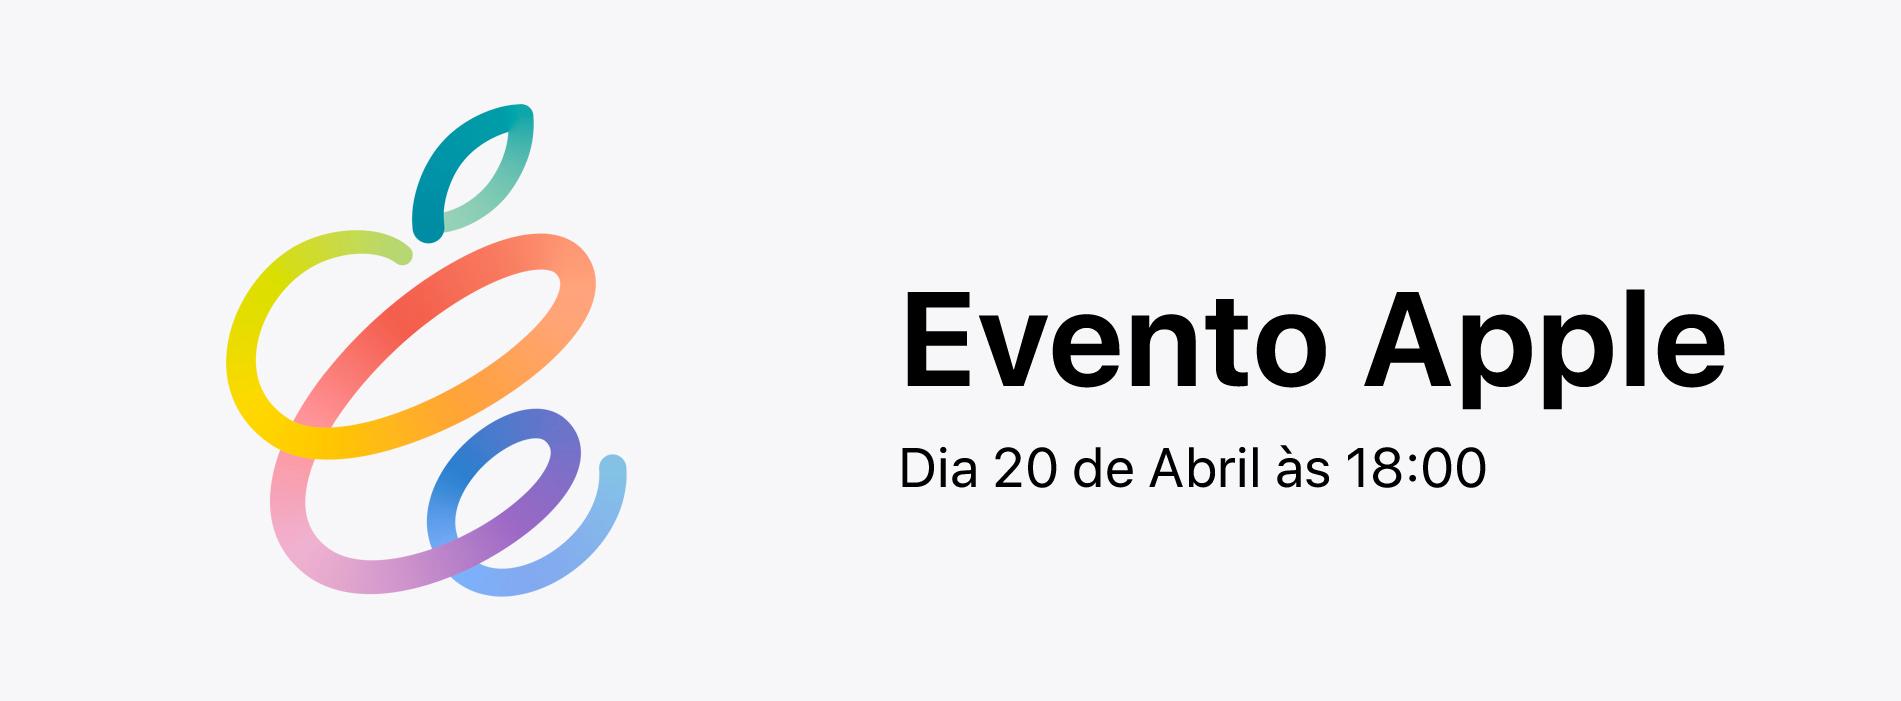 Homepage Slideshow - Evento Apple